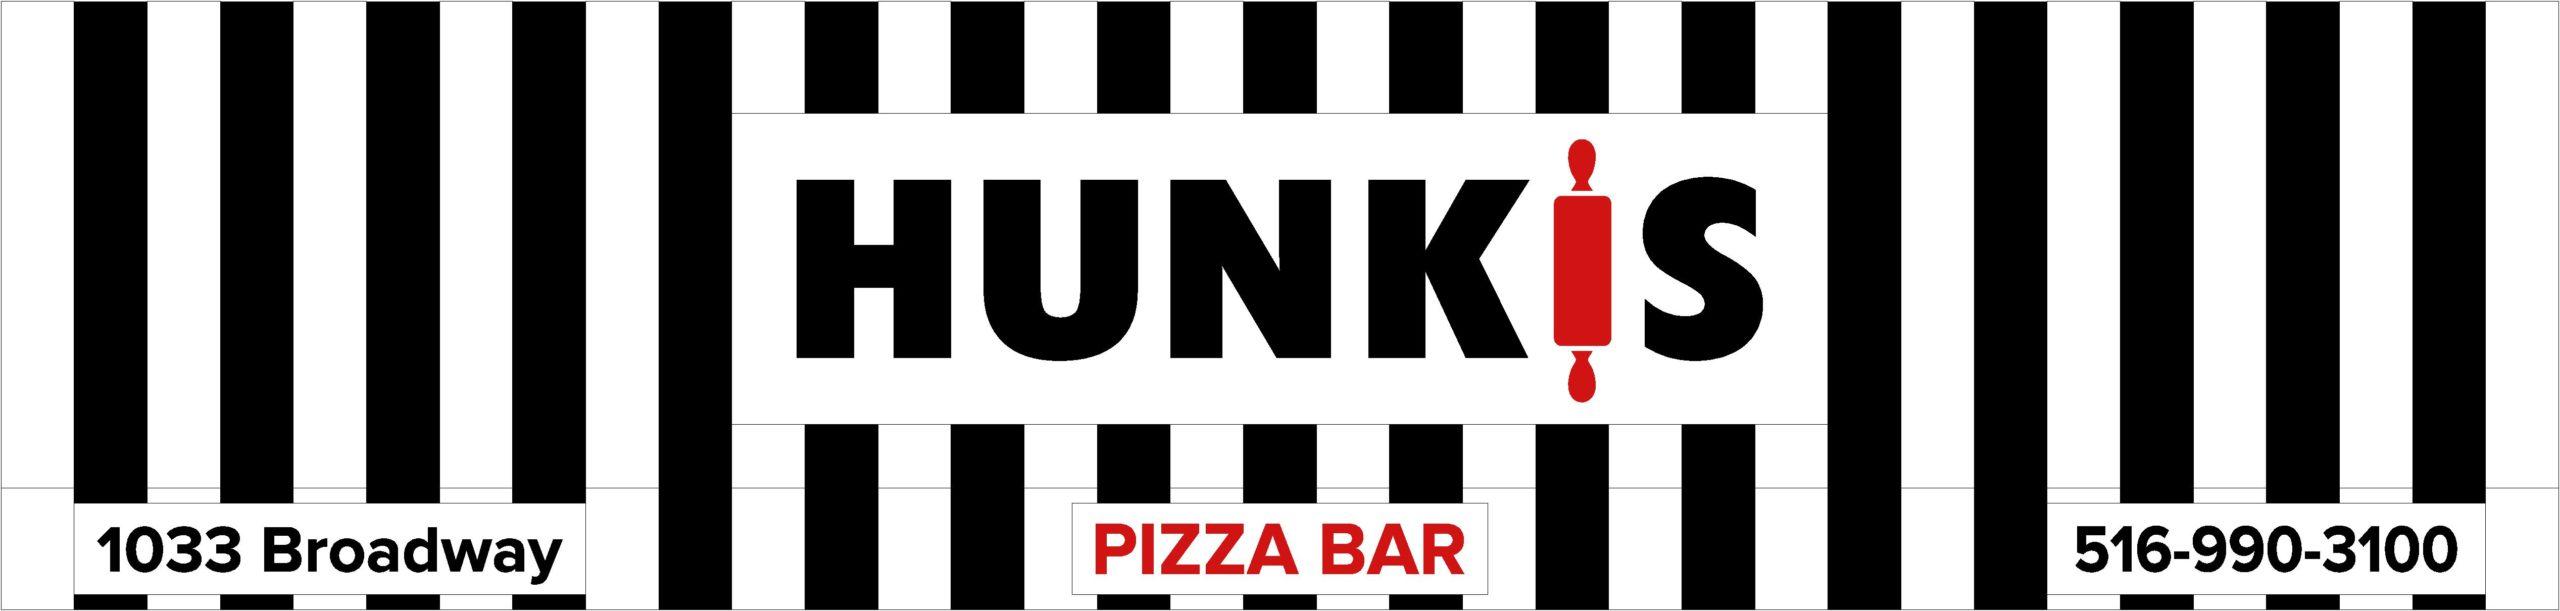 Hunkis Pizza Bar